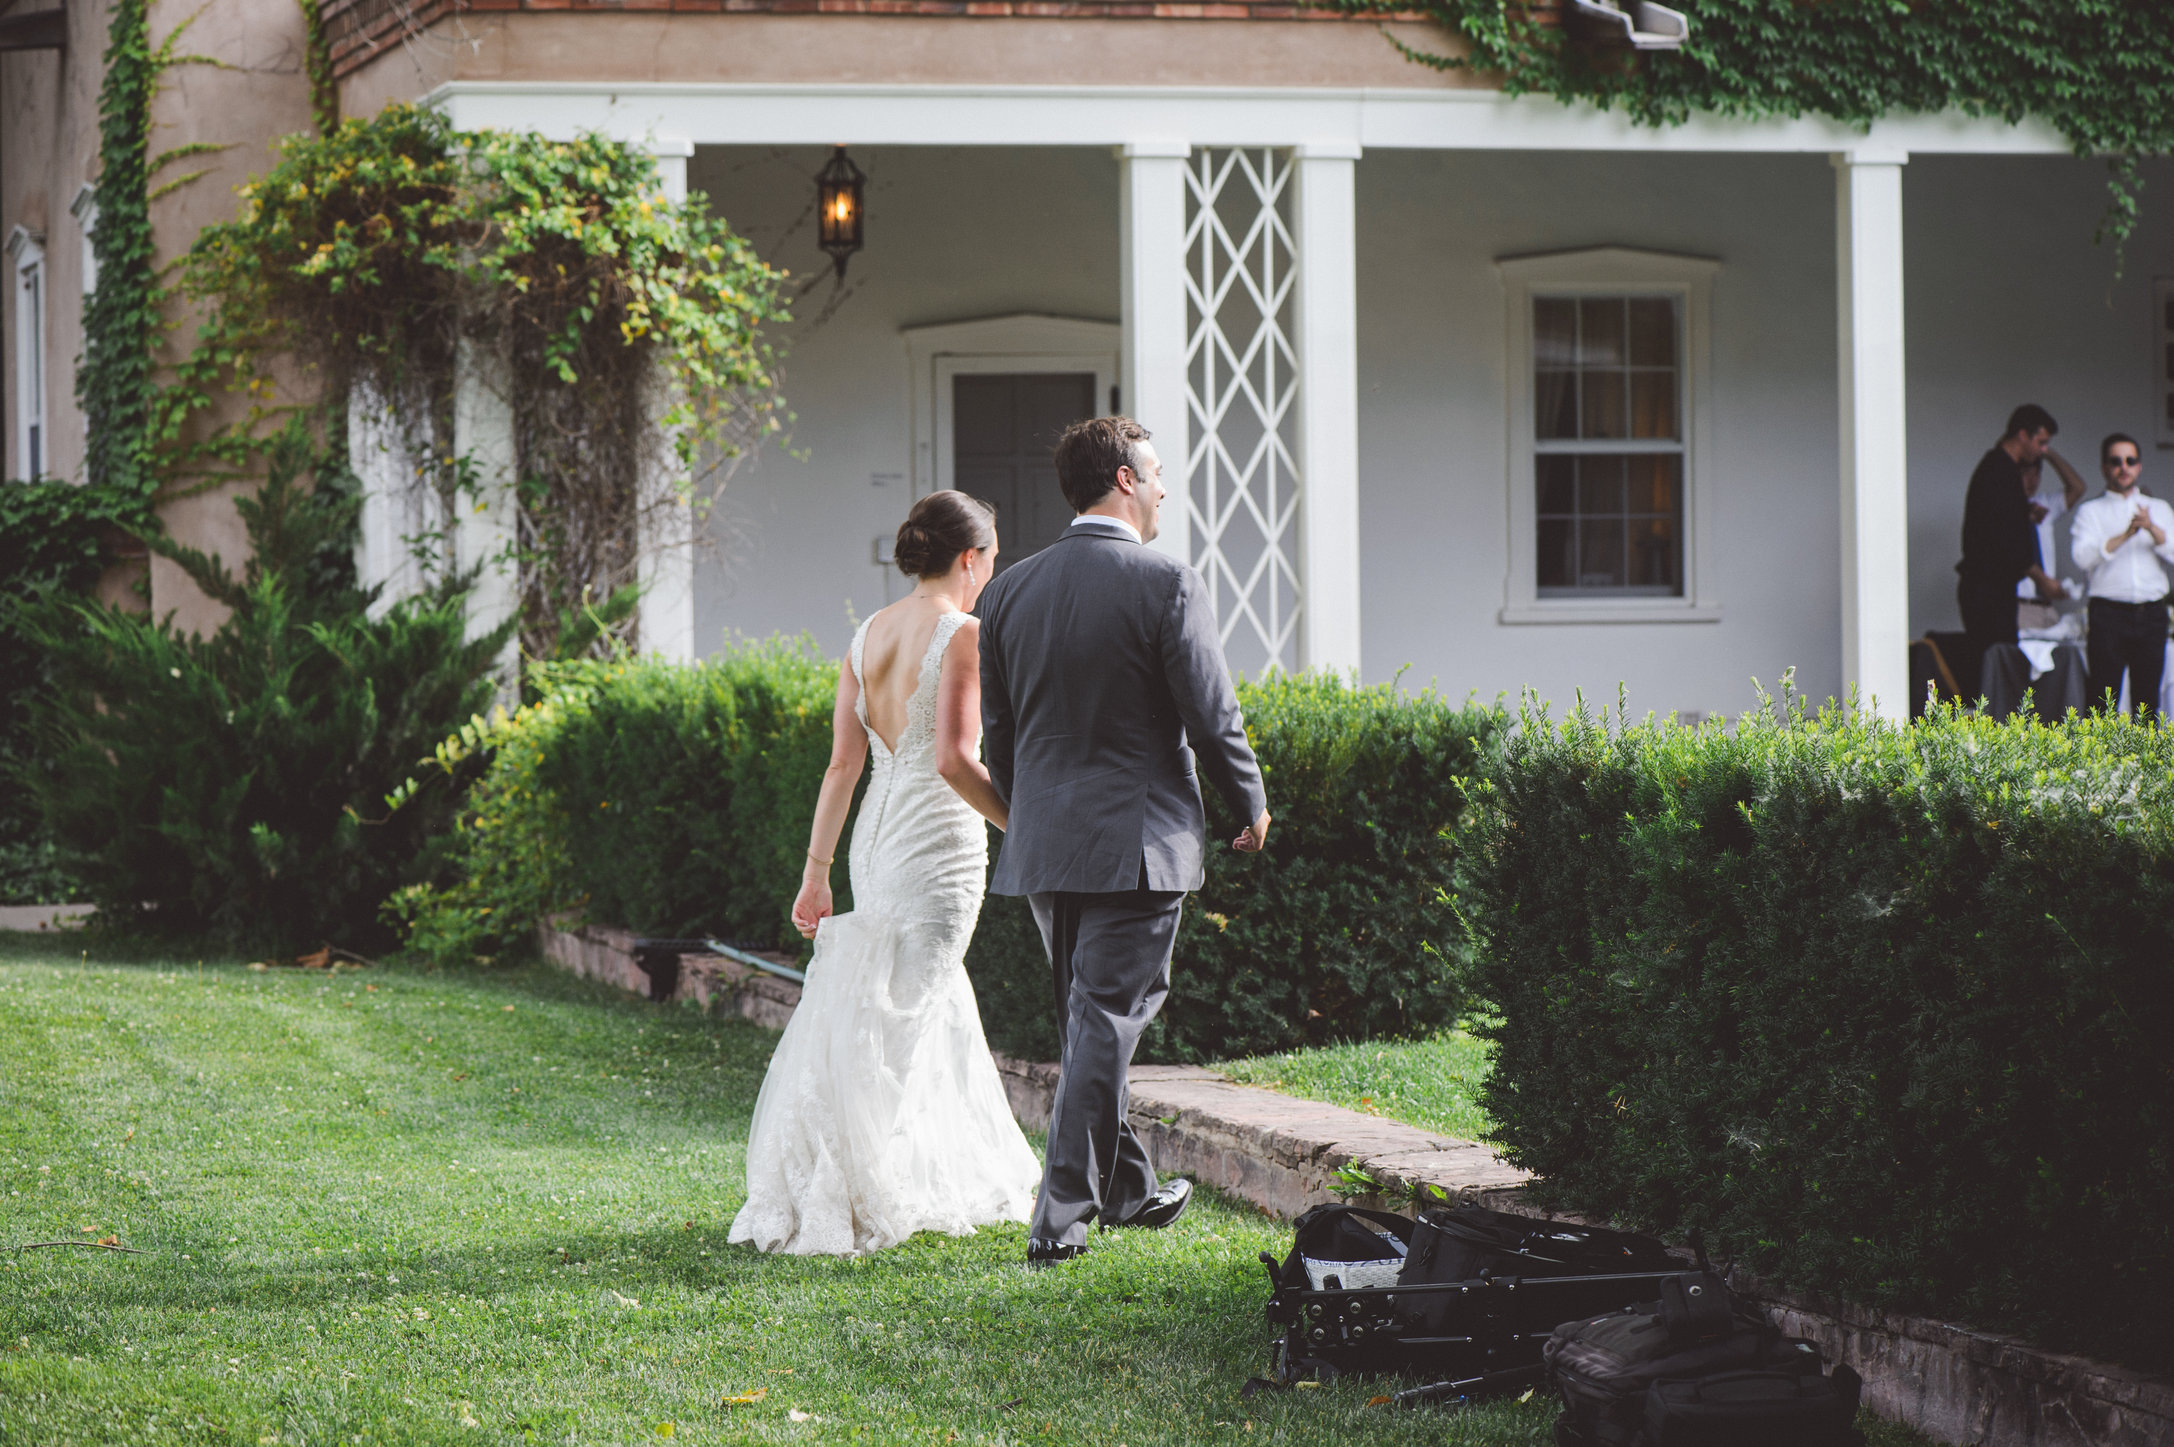 SandC-wedding-456.jpg